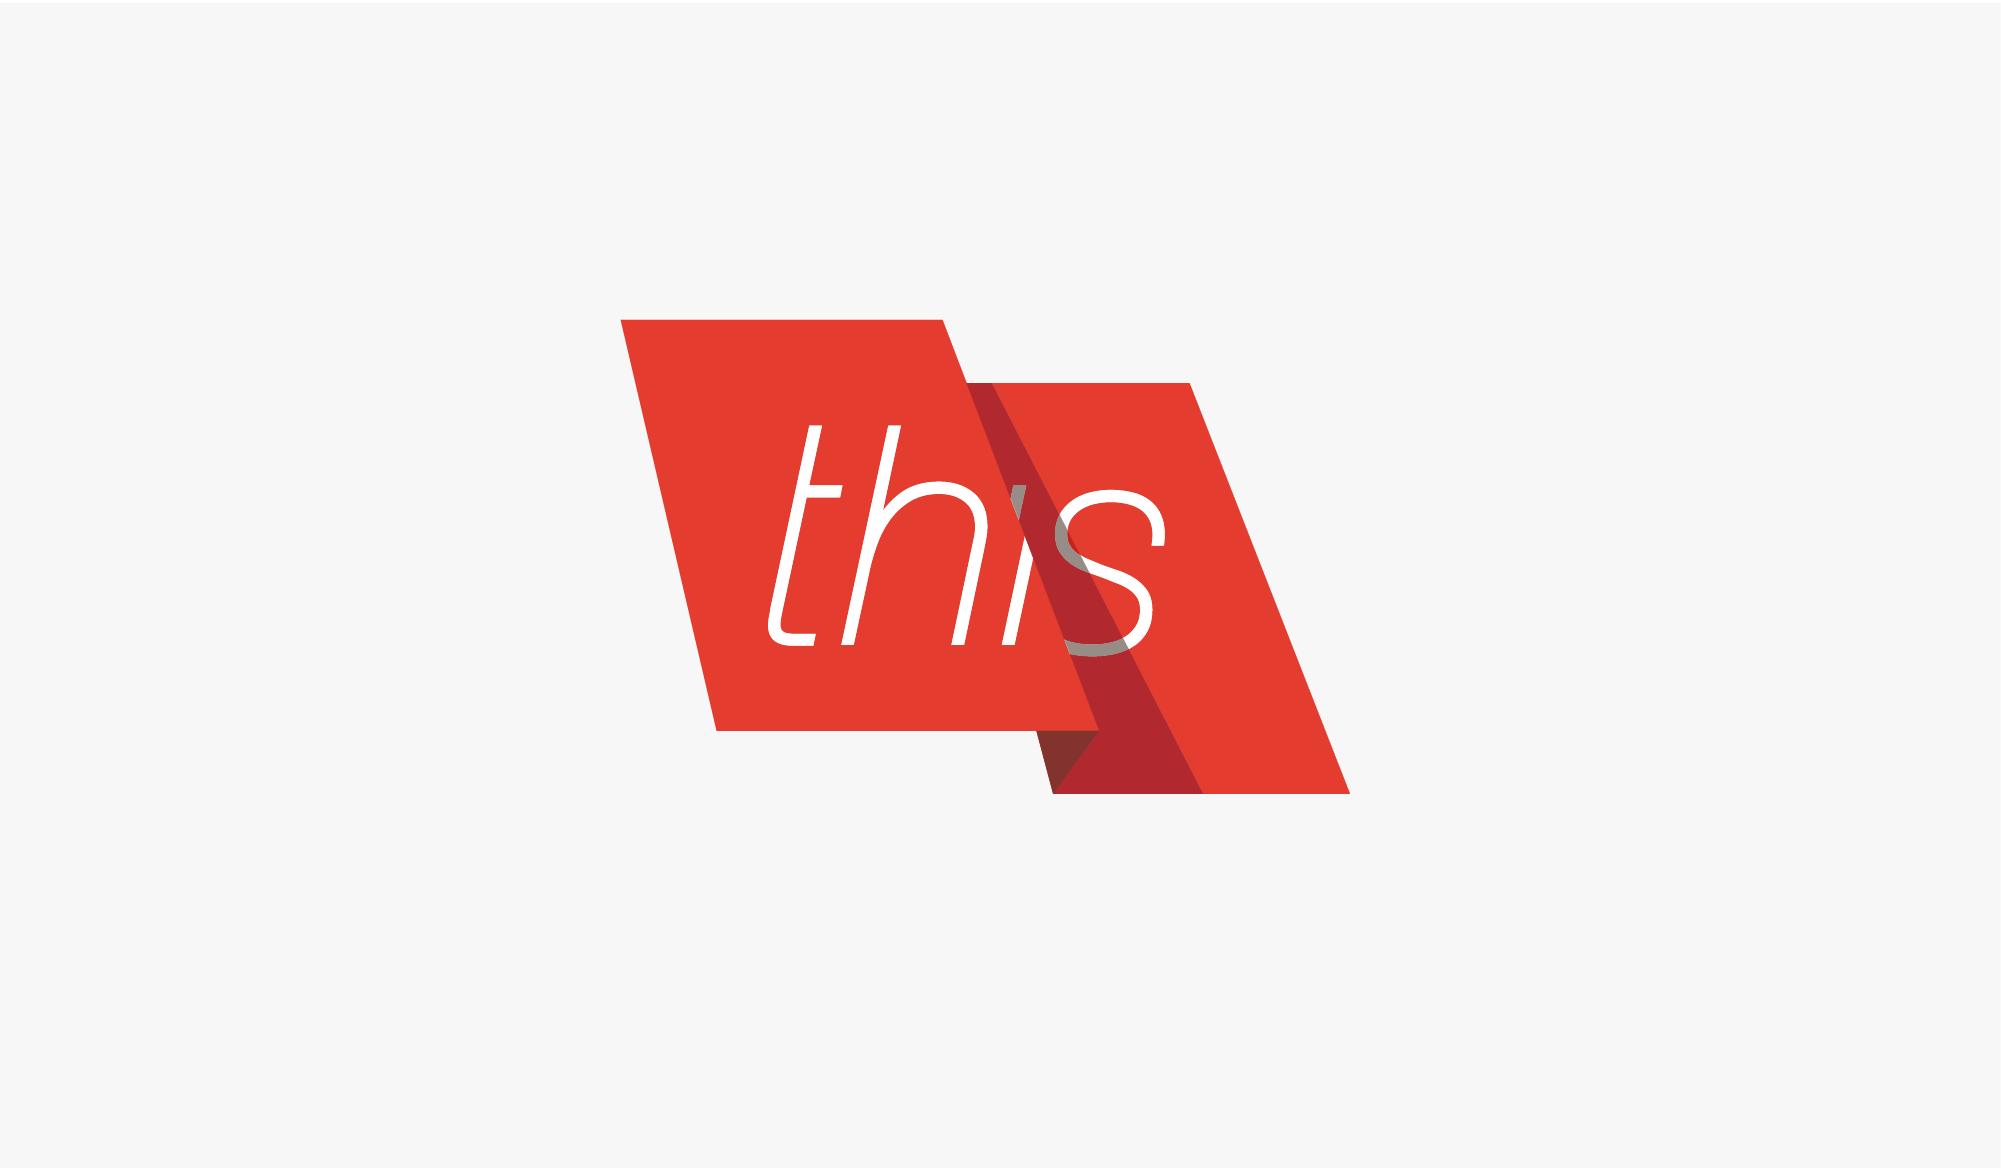 sb-logo-this-05